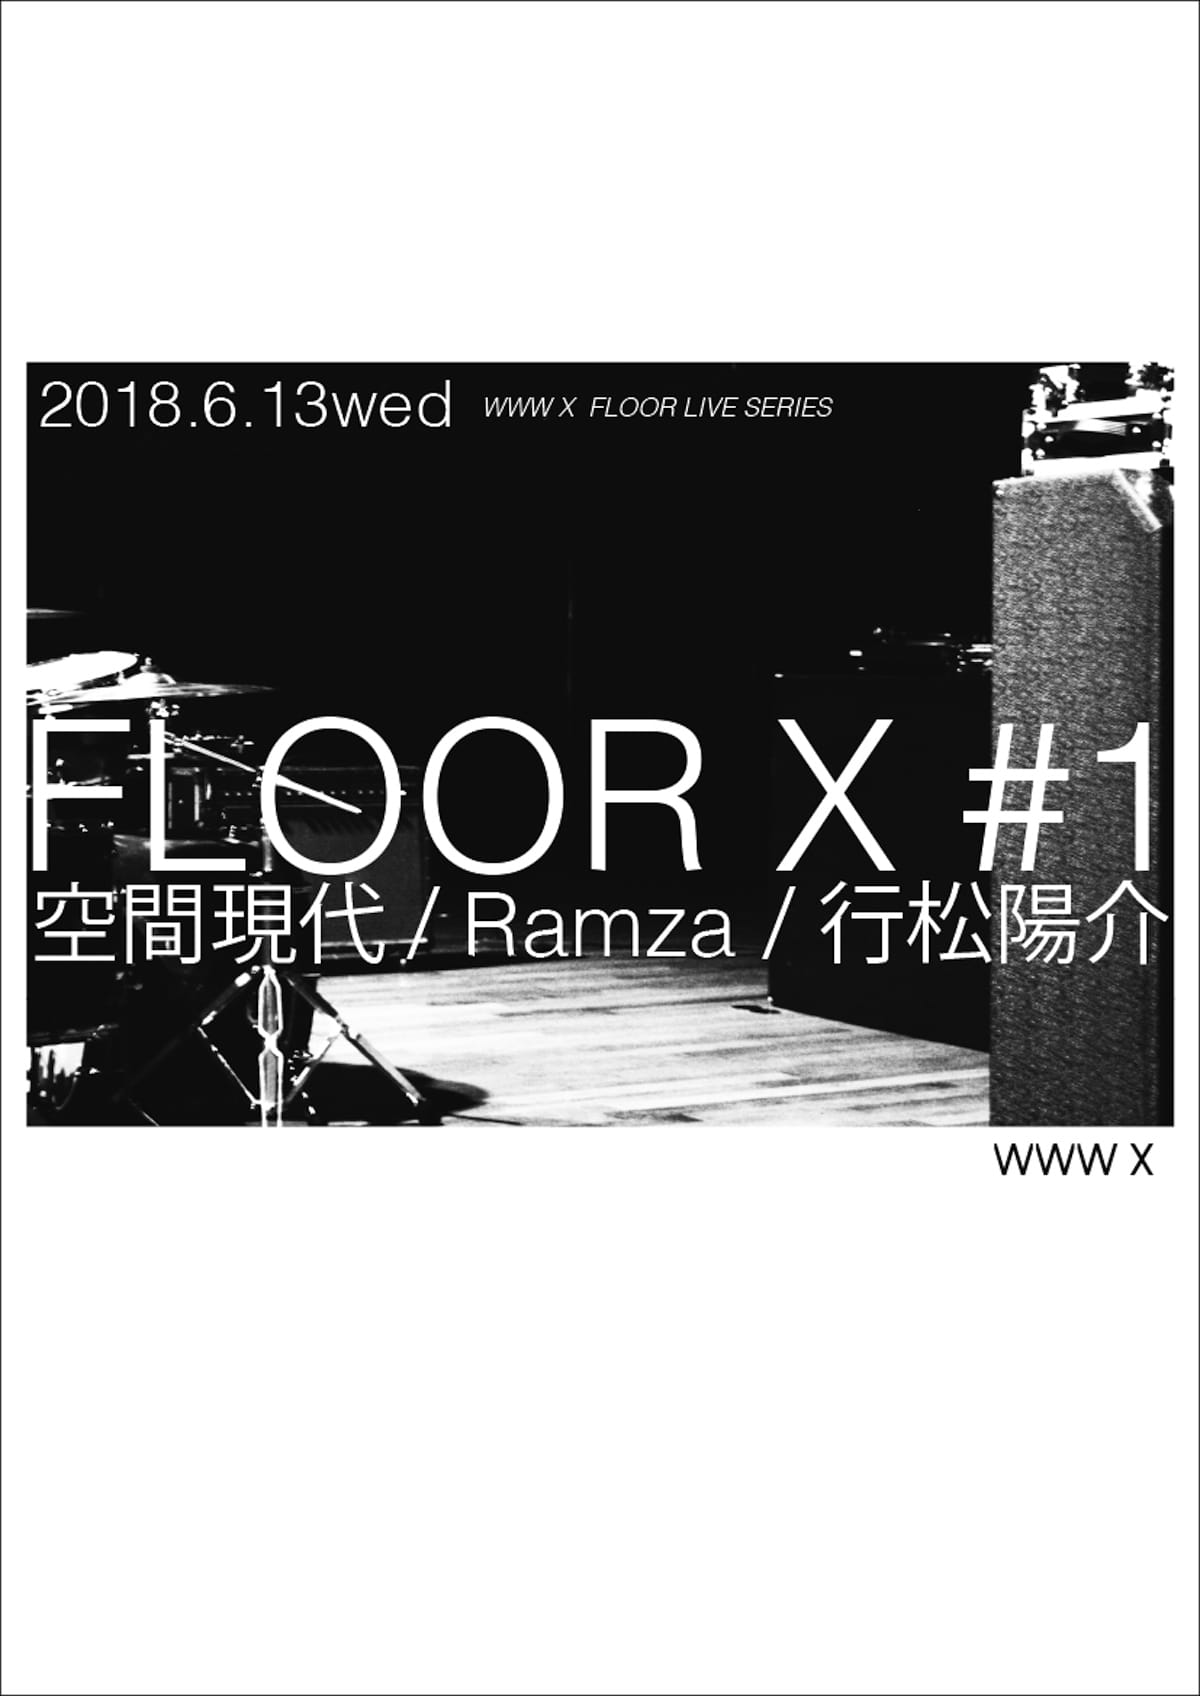 WWW Xで新たに始動のフロアLIVEシリーズ<FLOOR X #1>に空間現代、Ramza、行松陽介が登場 music180422_floor_x_2-1200x1696